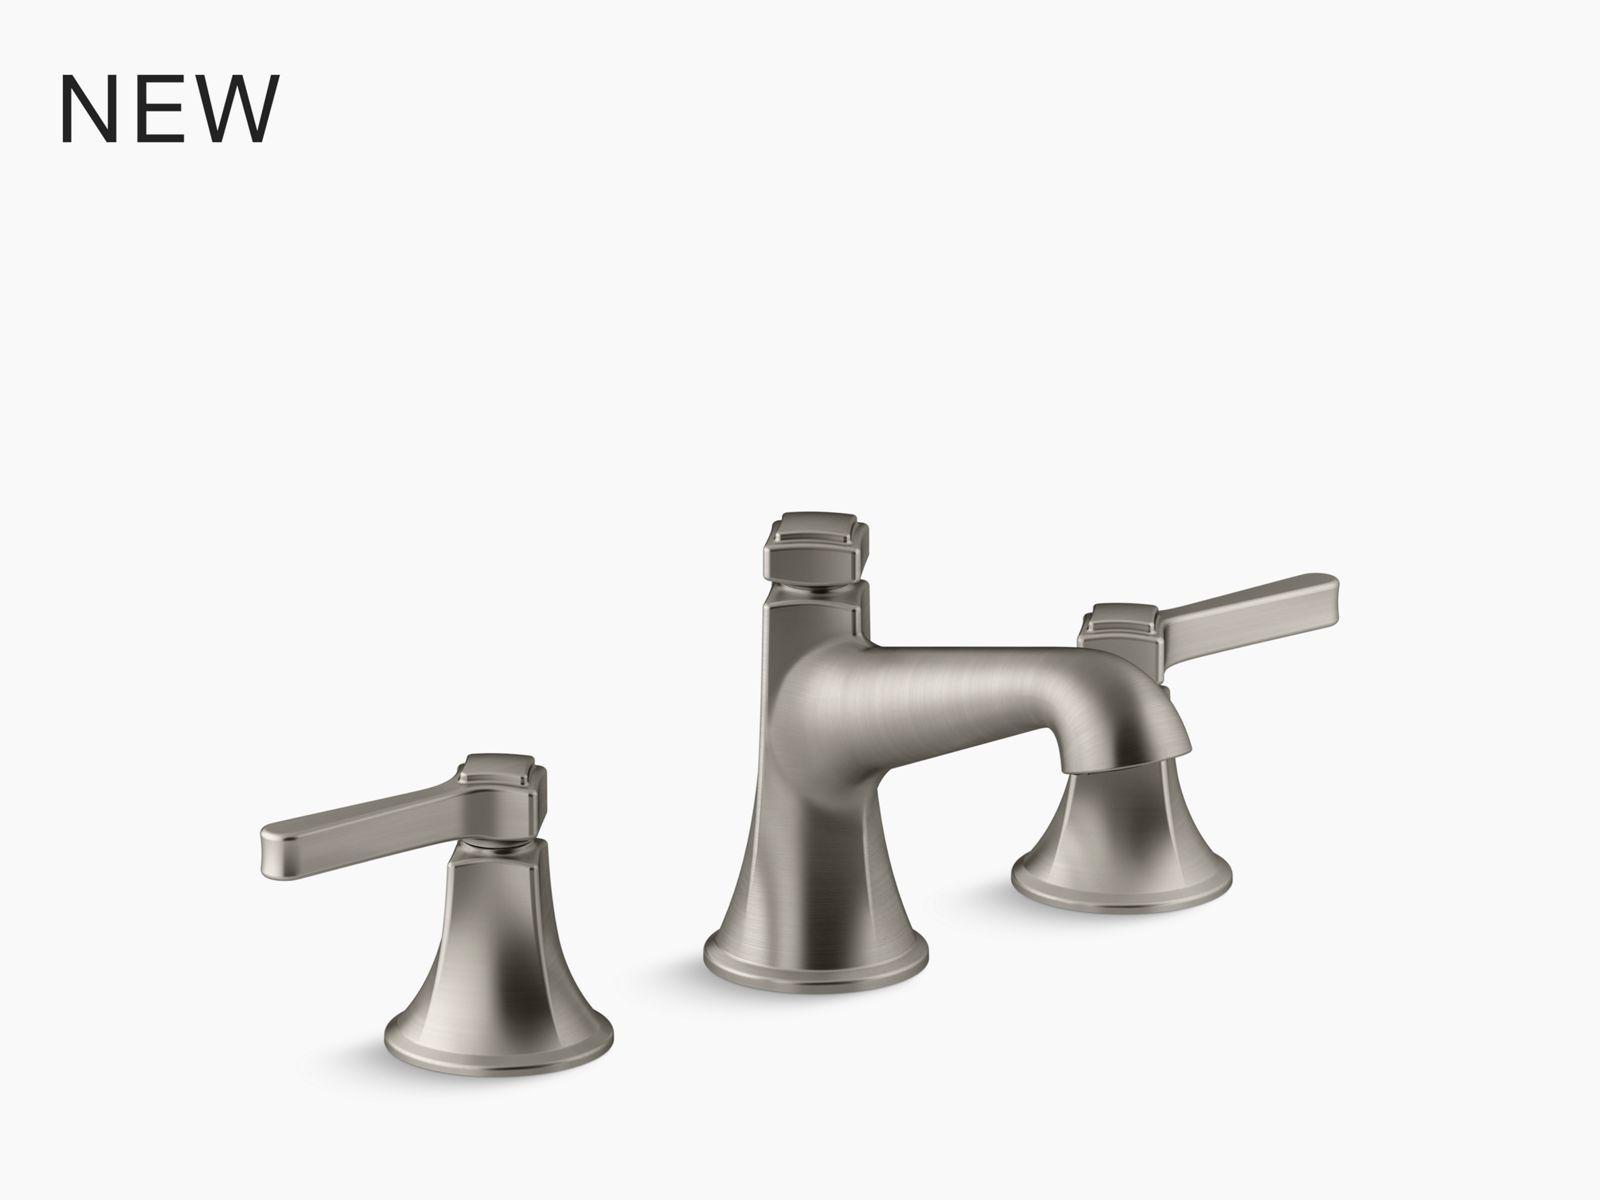 kallan widespread bathroom sink faucet